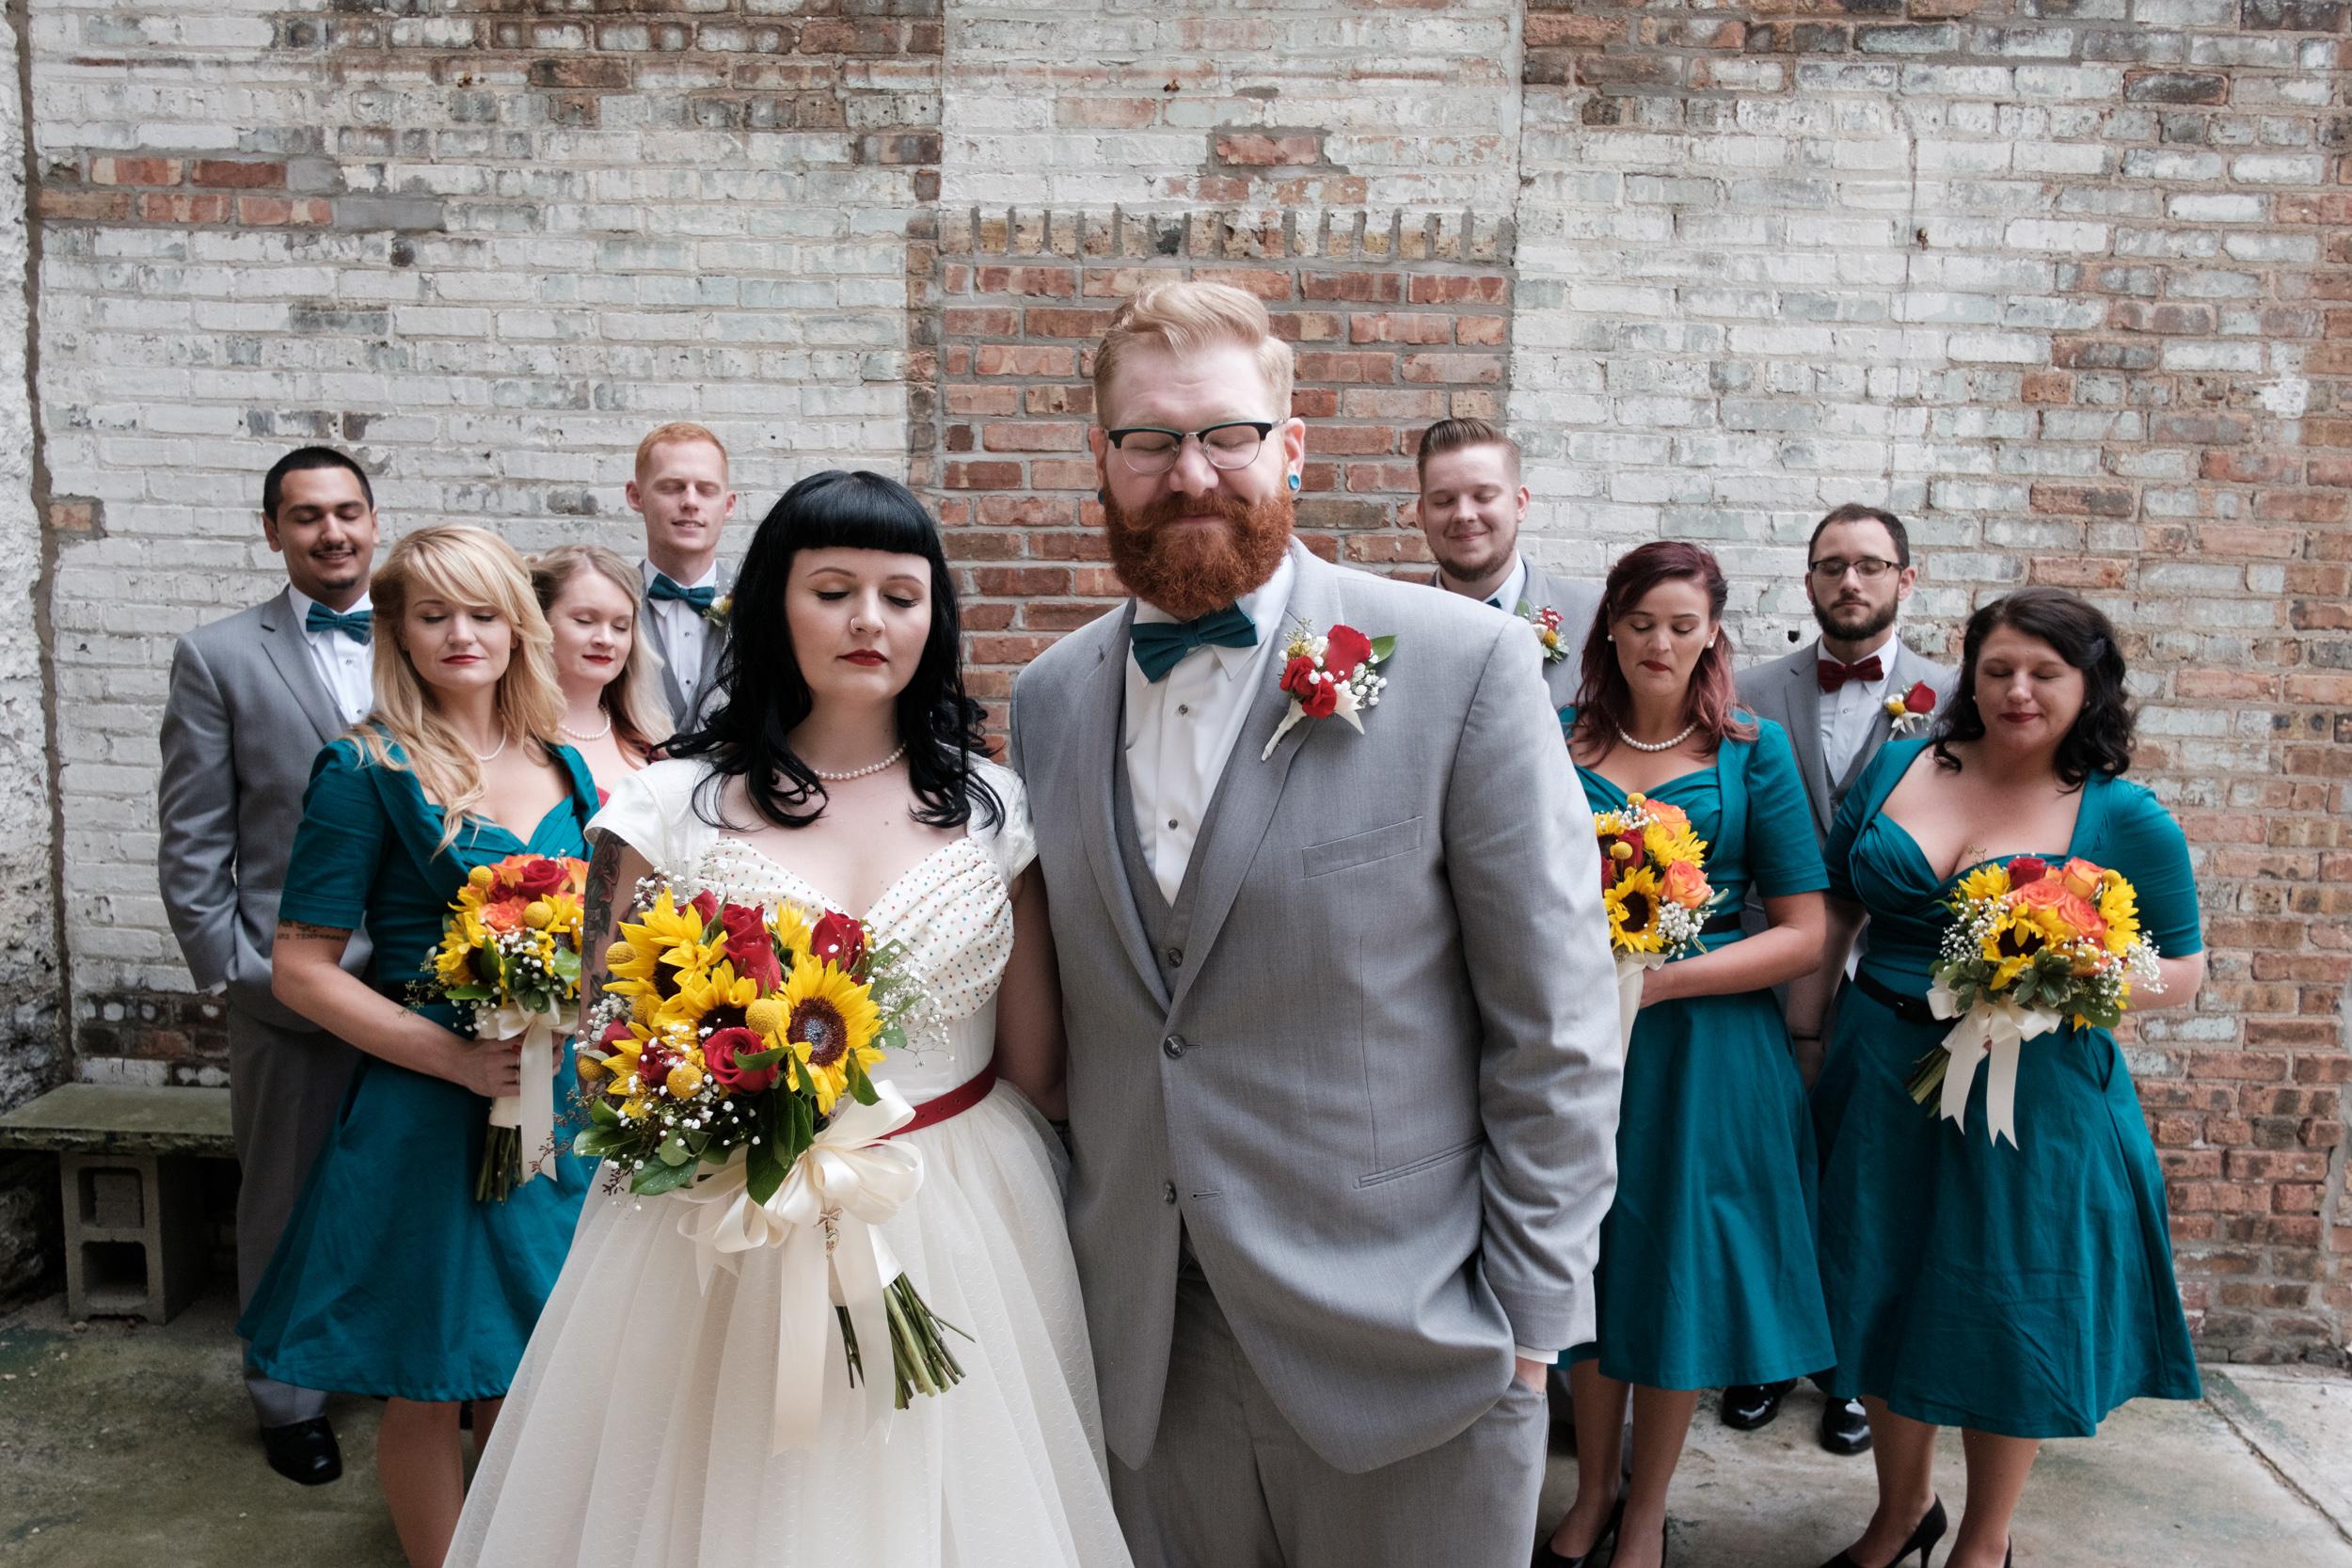 Christian & Sarah wedding photography by Brian milo-191.jpg